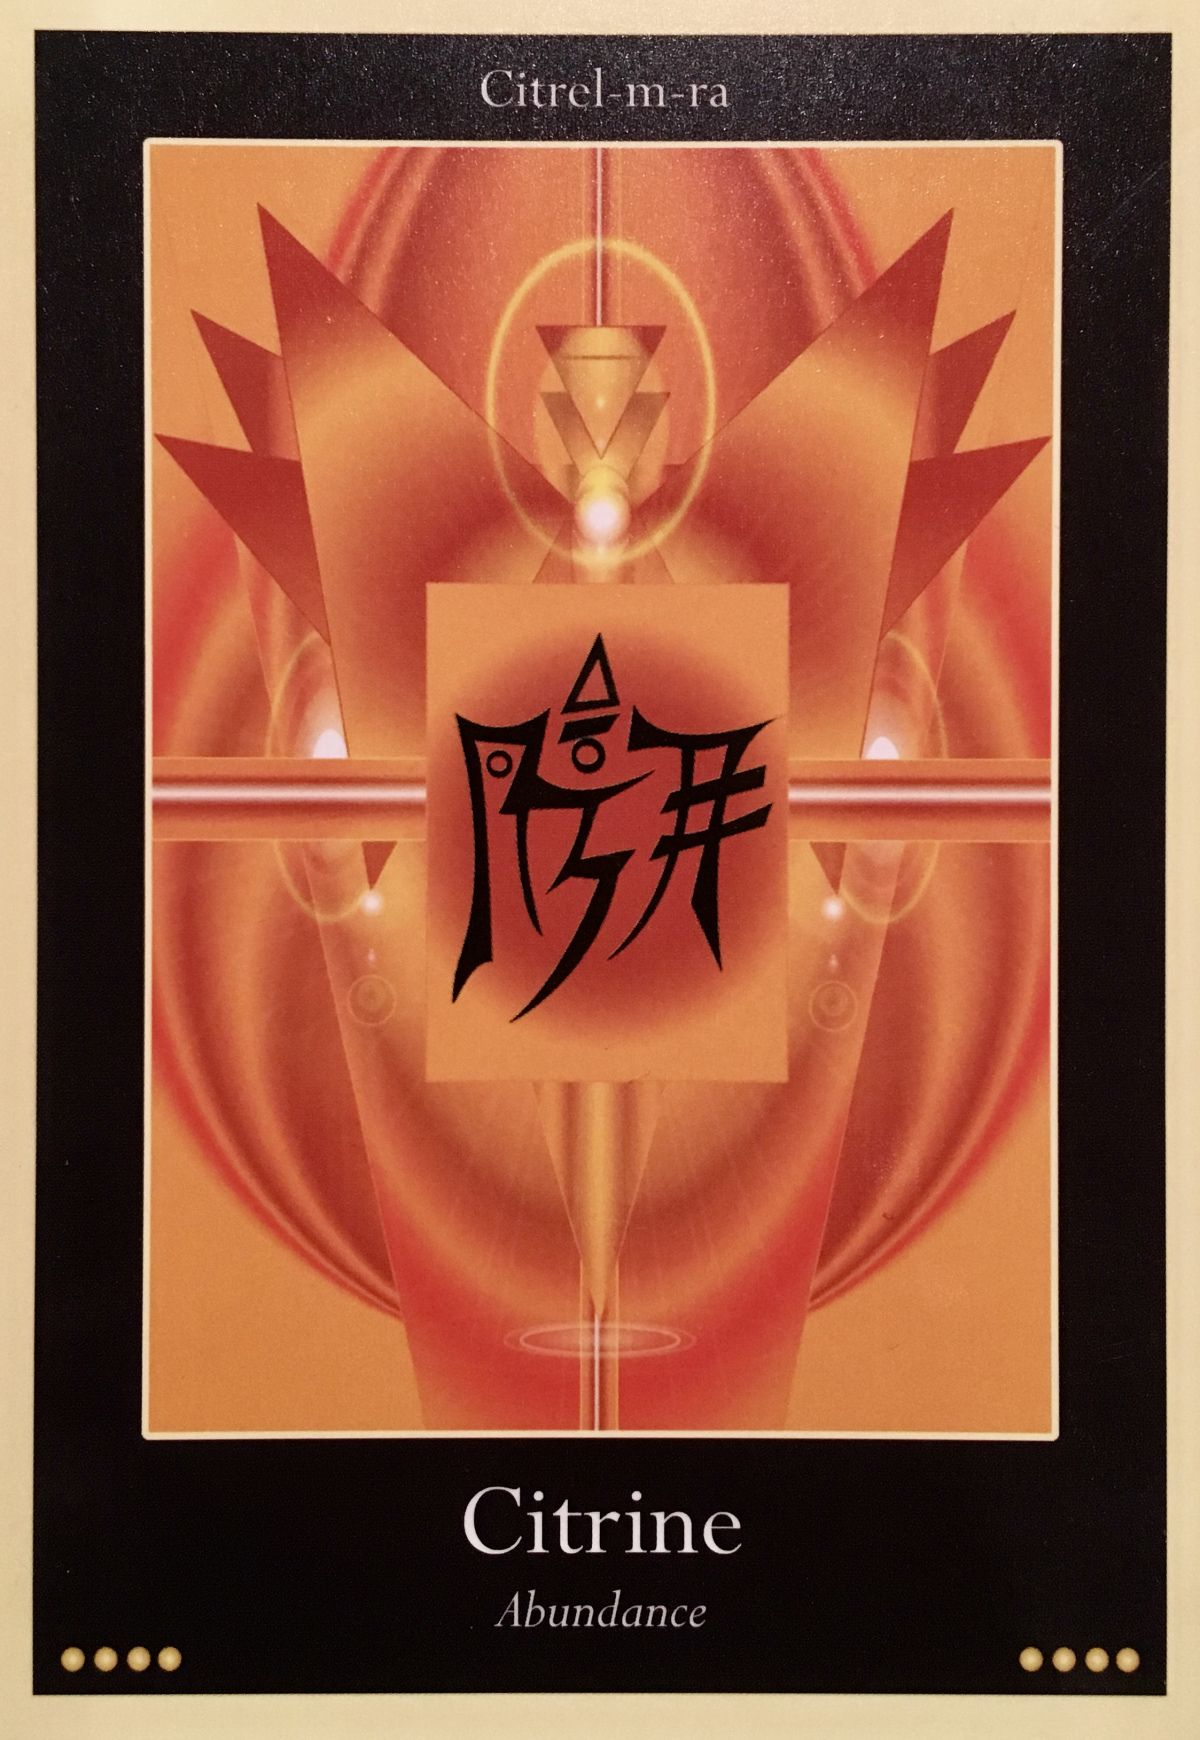 Citrine ~ Abundance, from the Liquid Crystal Oracle Card deck, by Justin Moikeha Asar